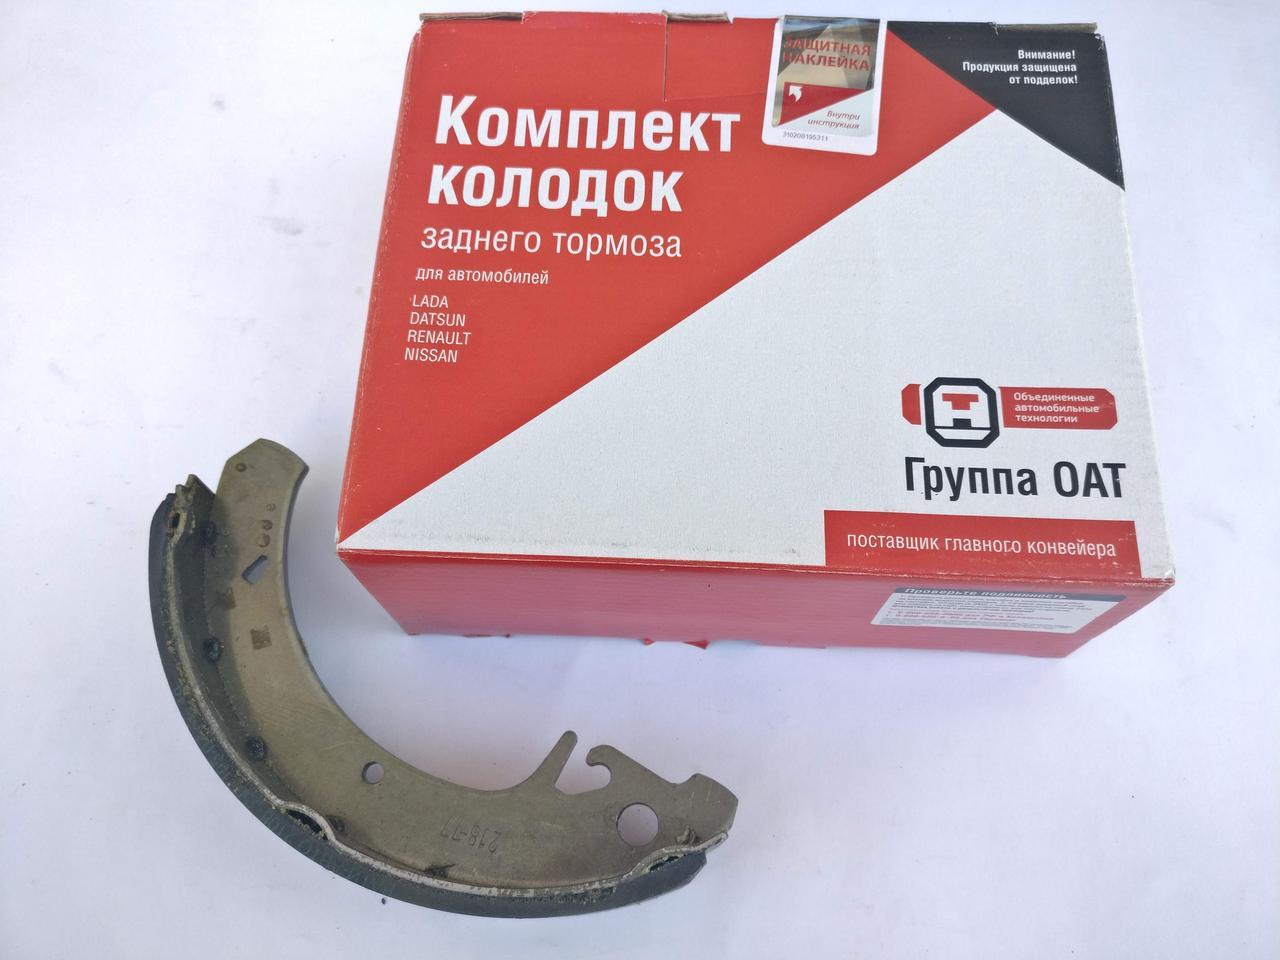 Колодка тормозная задняя ВАЗ 2108 2109 2109 2113 2114 2115 2170-72 1117-19 ВИС комплект